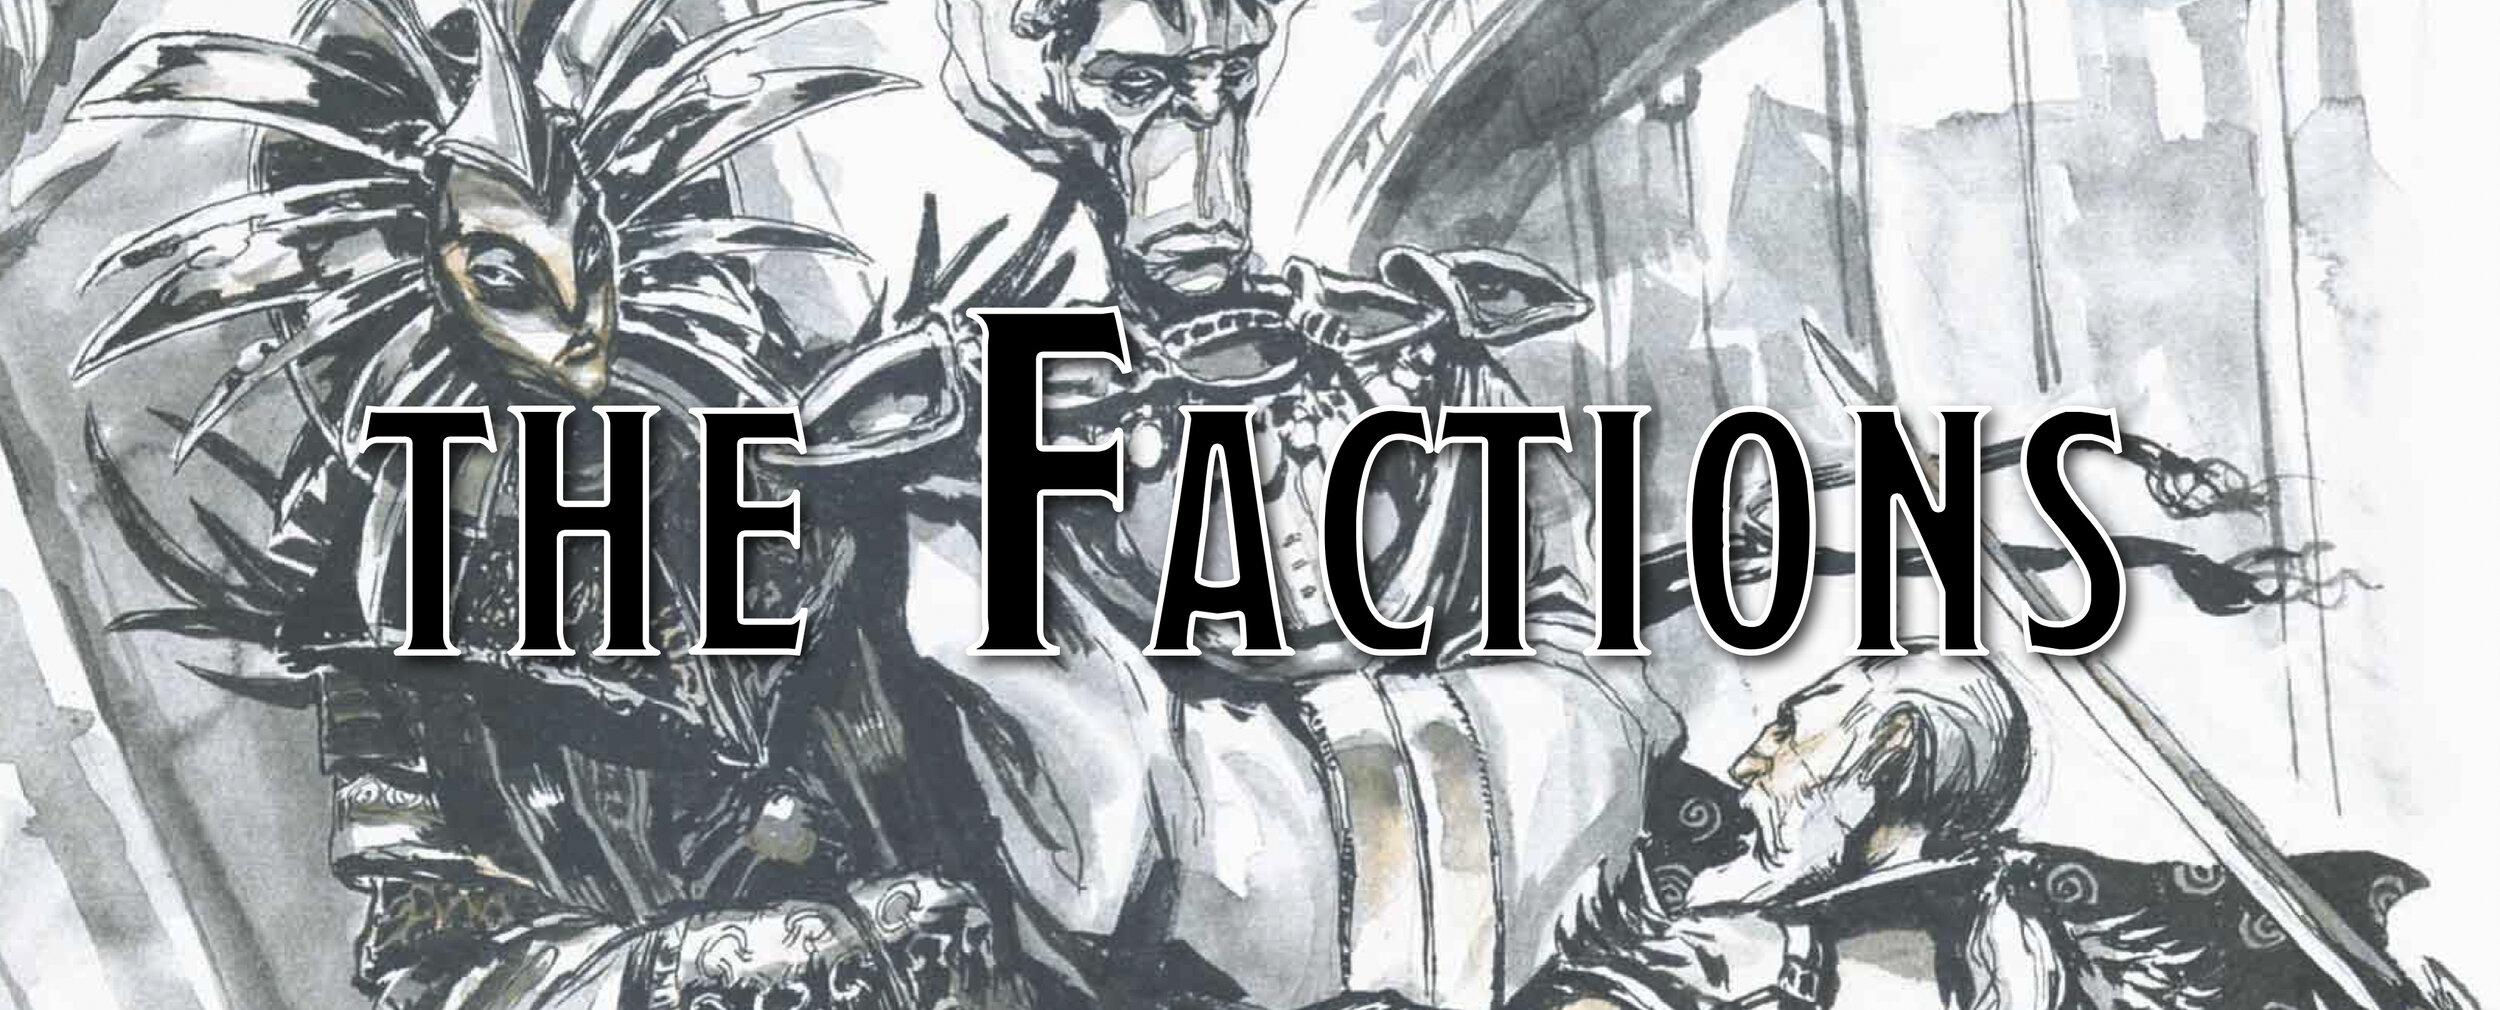 World the faction test secret Templars